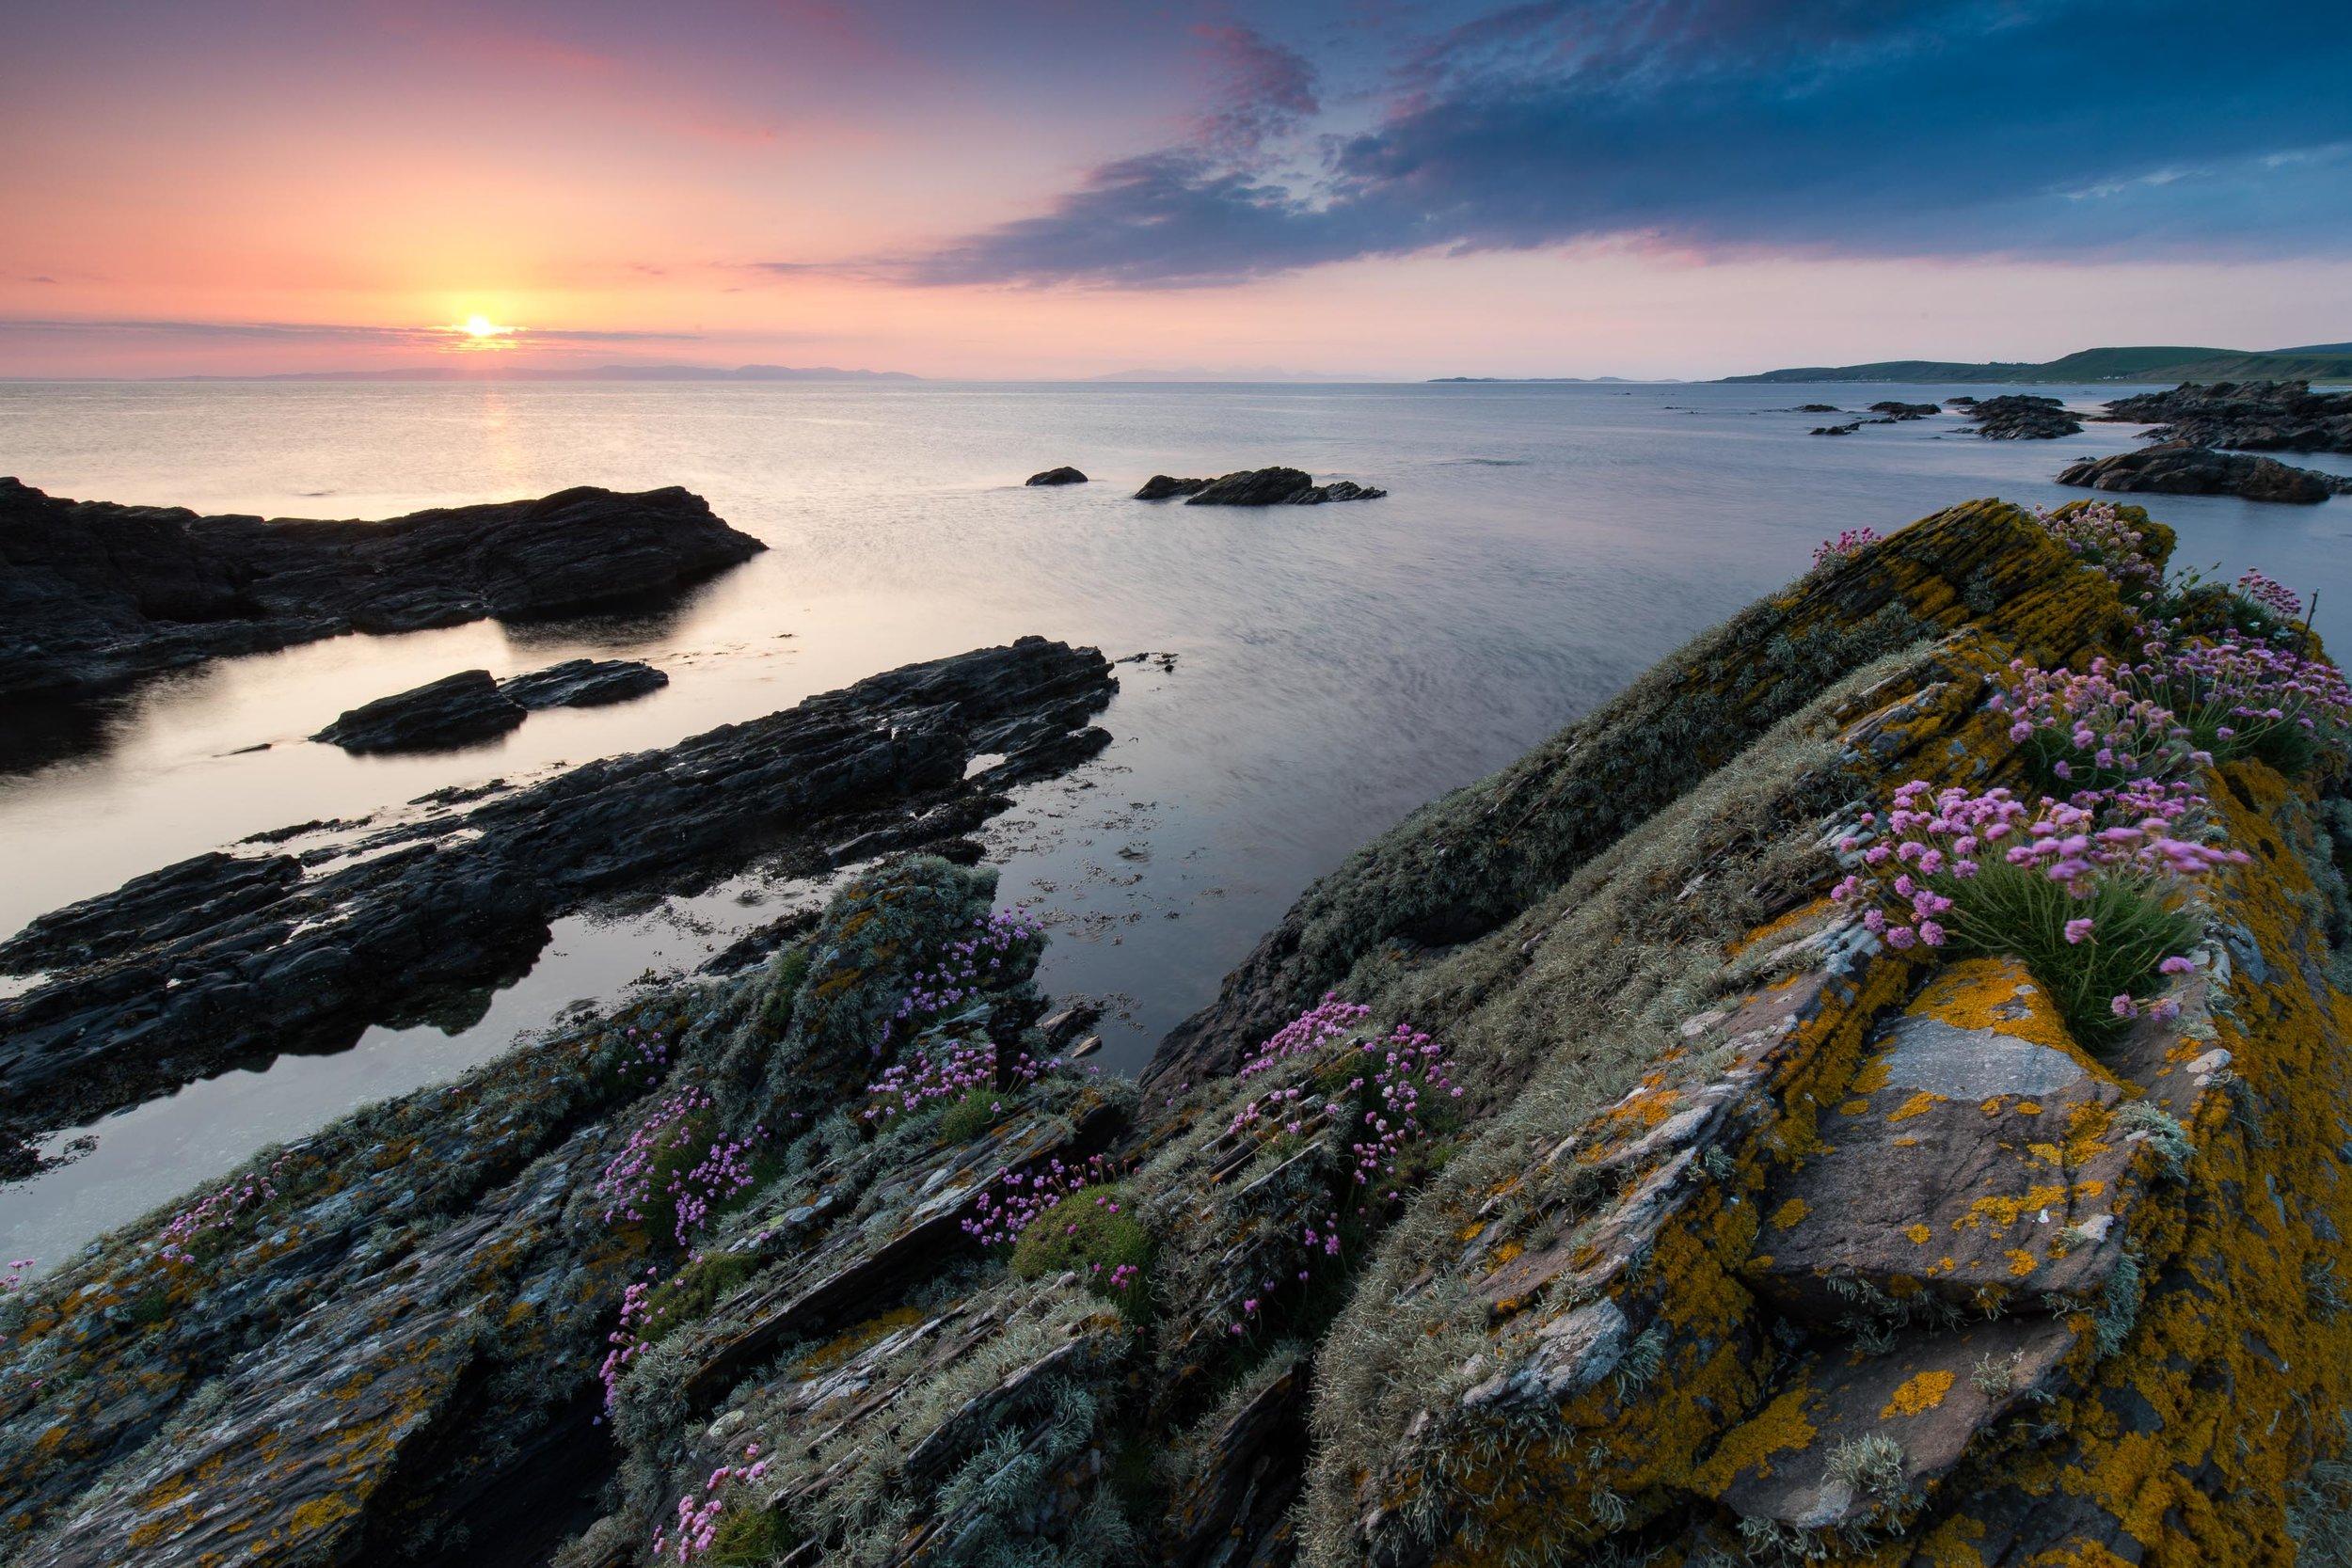 SCOTLAND - SKYE + THE HIGHLANDS